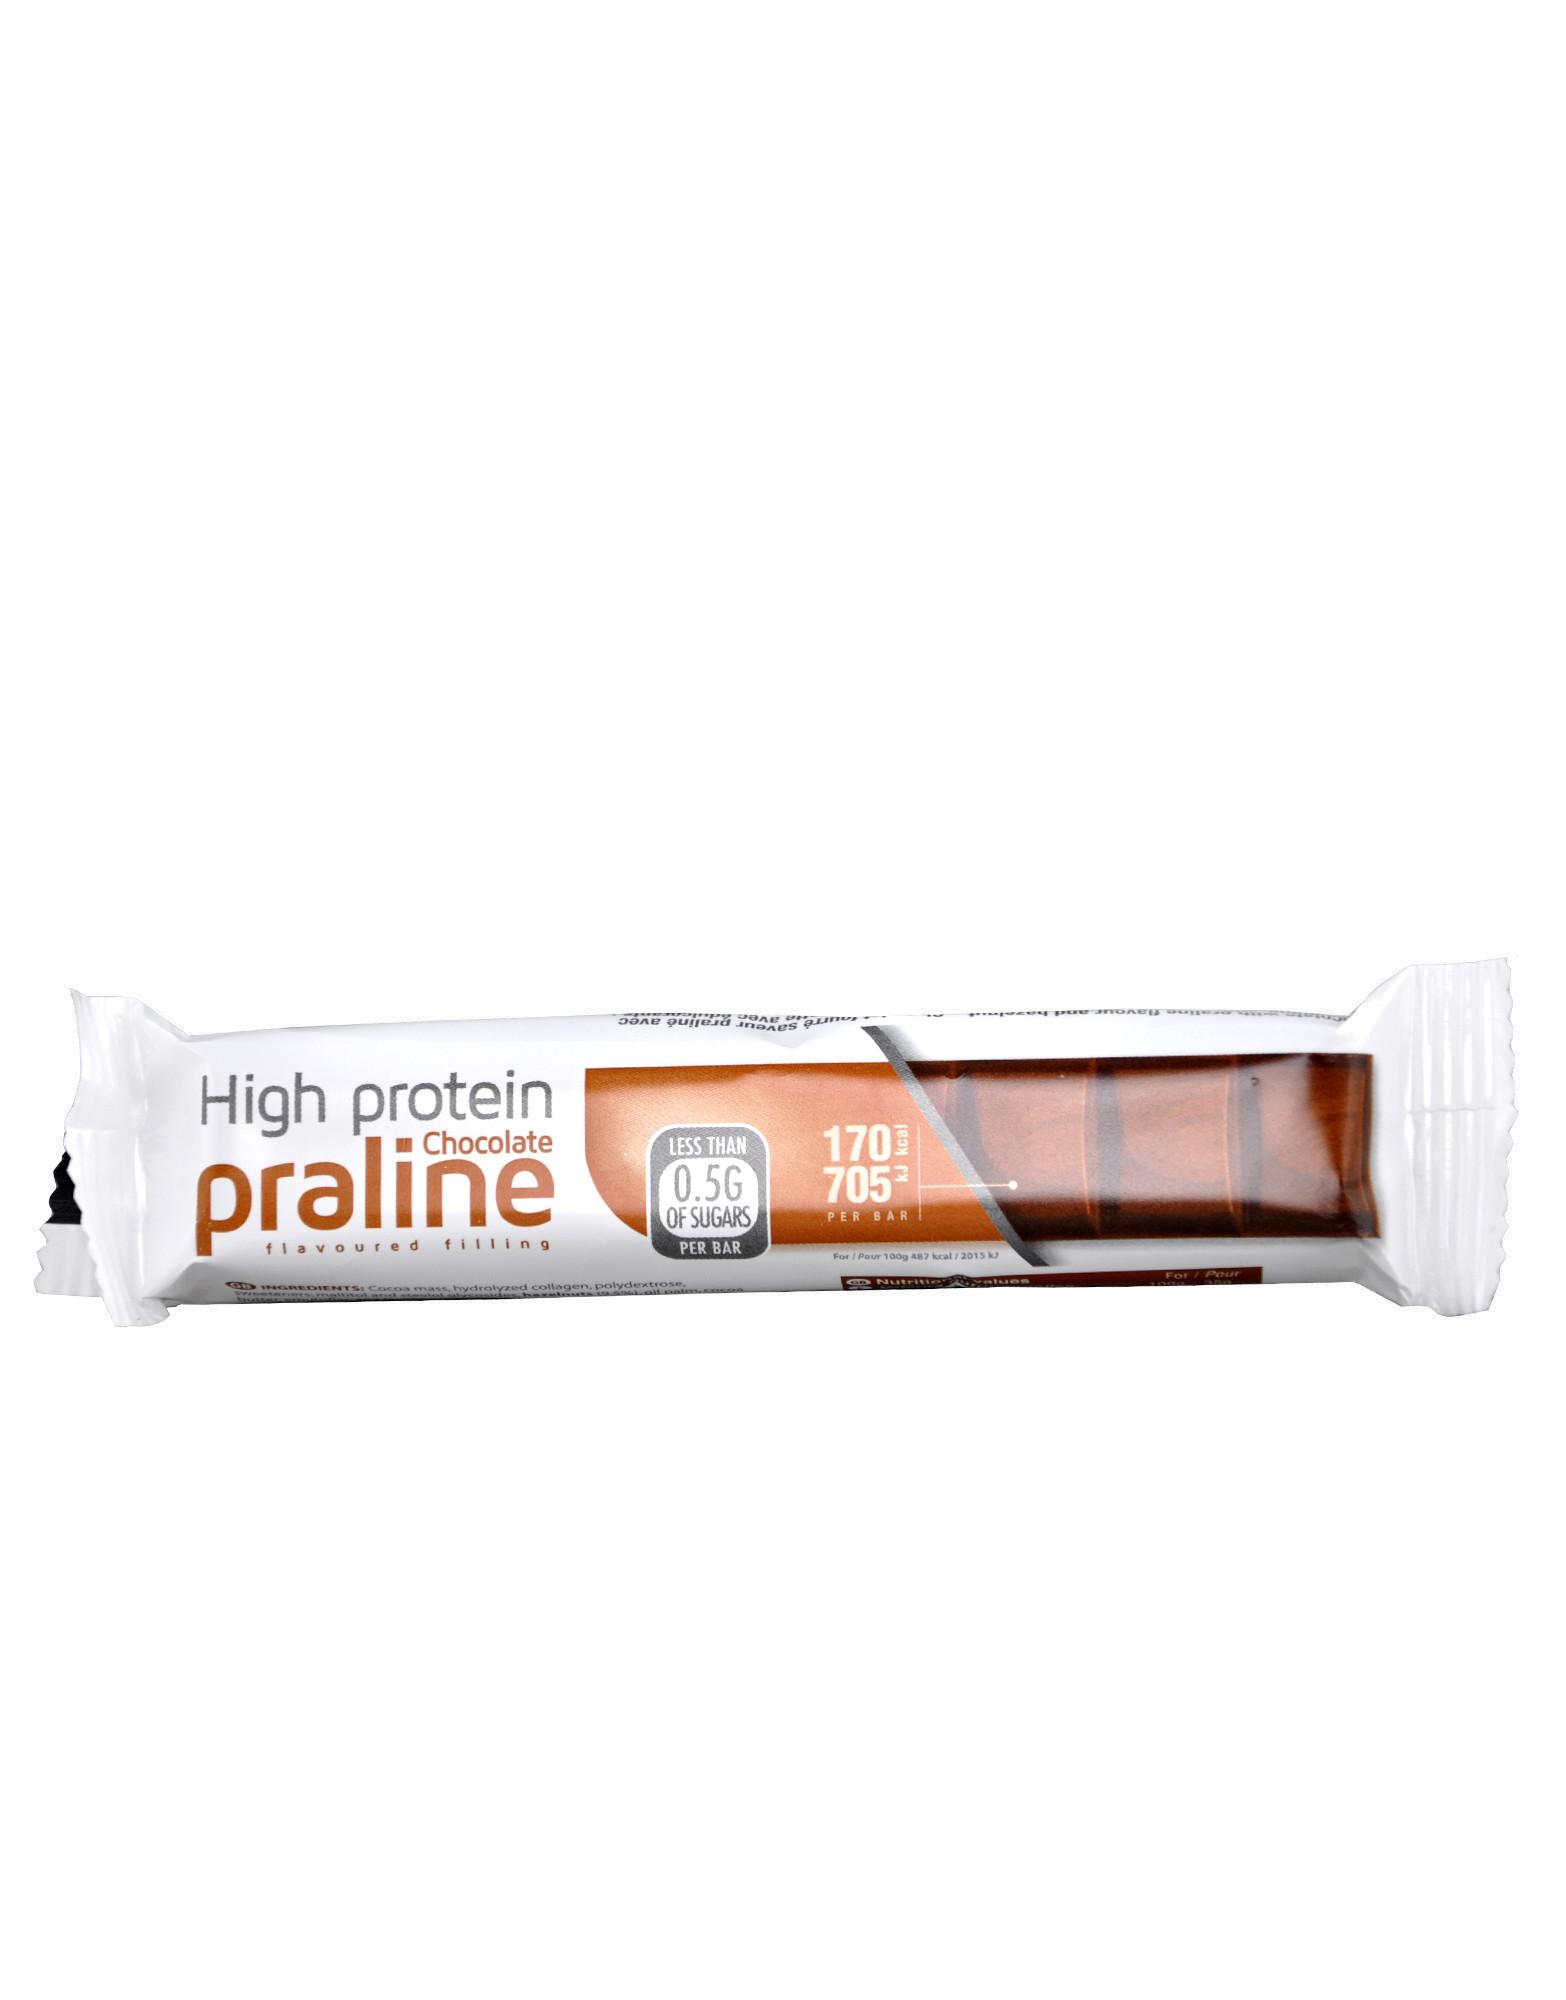 Protein Chocolate Bars In Pakistan